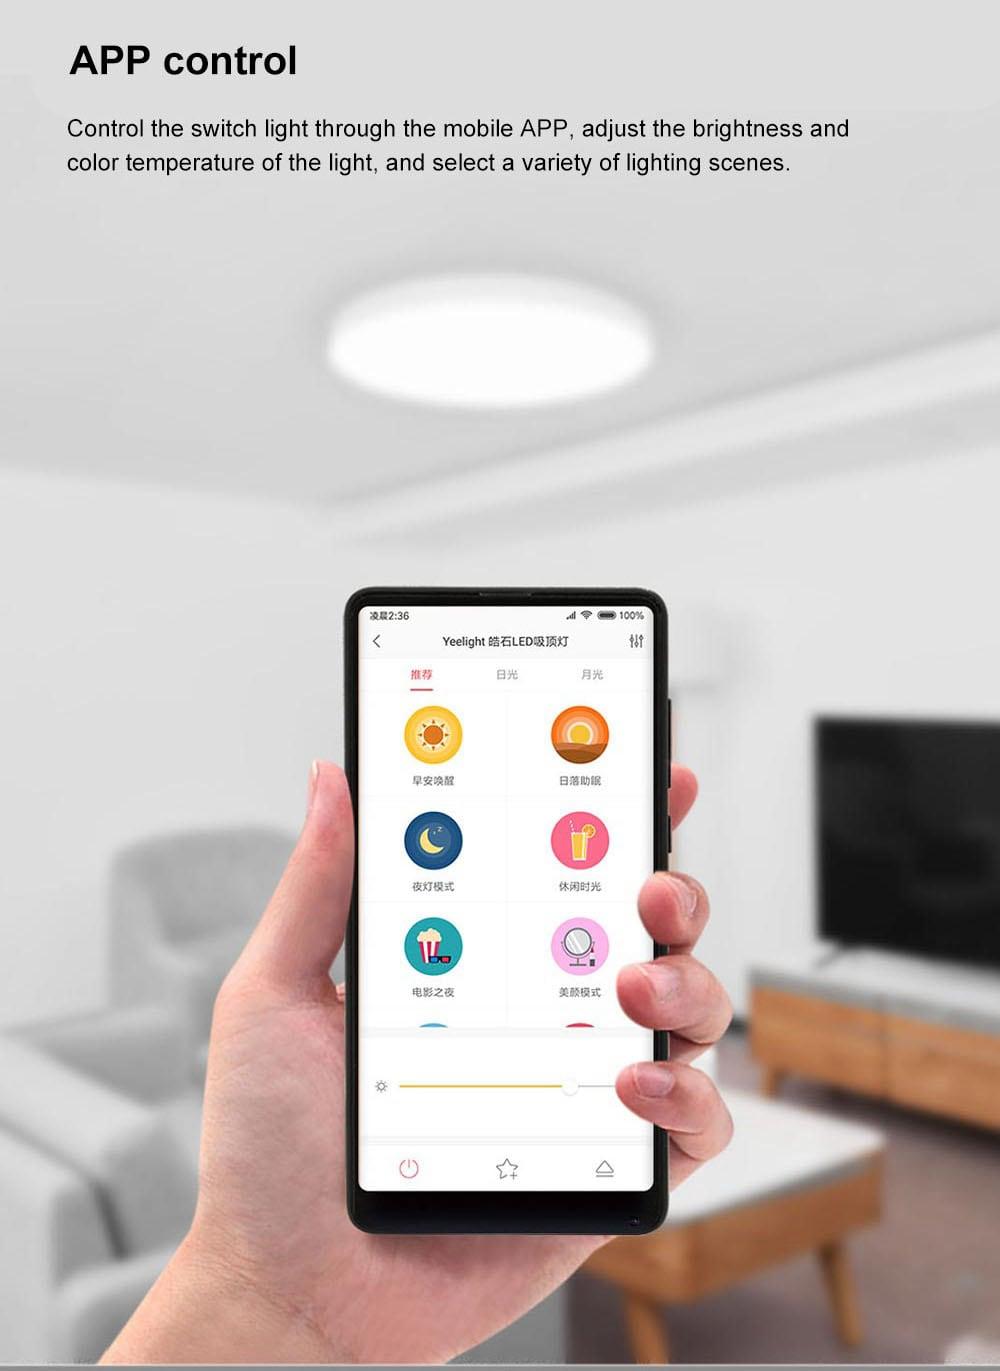 Yeelight 35W Nox Round Diamond Smart LED Ceiling Light for Home Bedroom Living Room (Xiaomi Ecosystem Product)